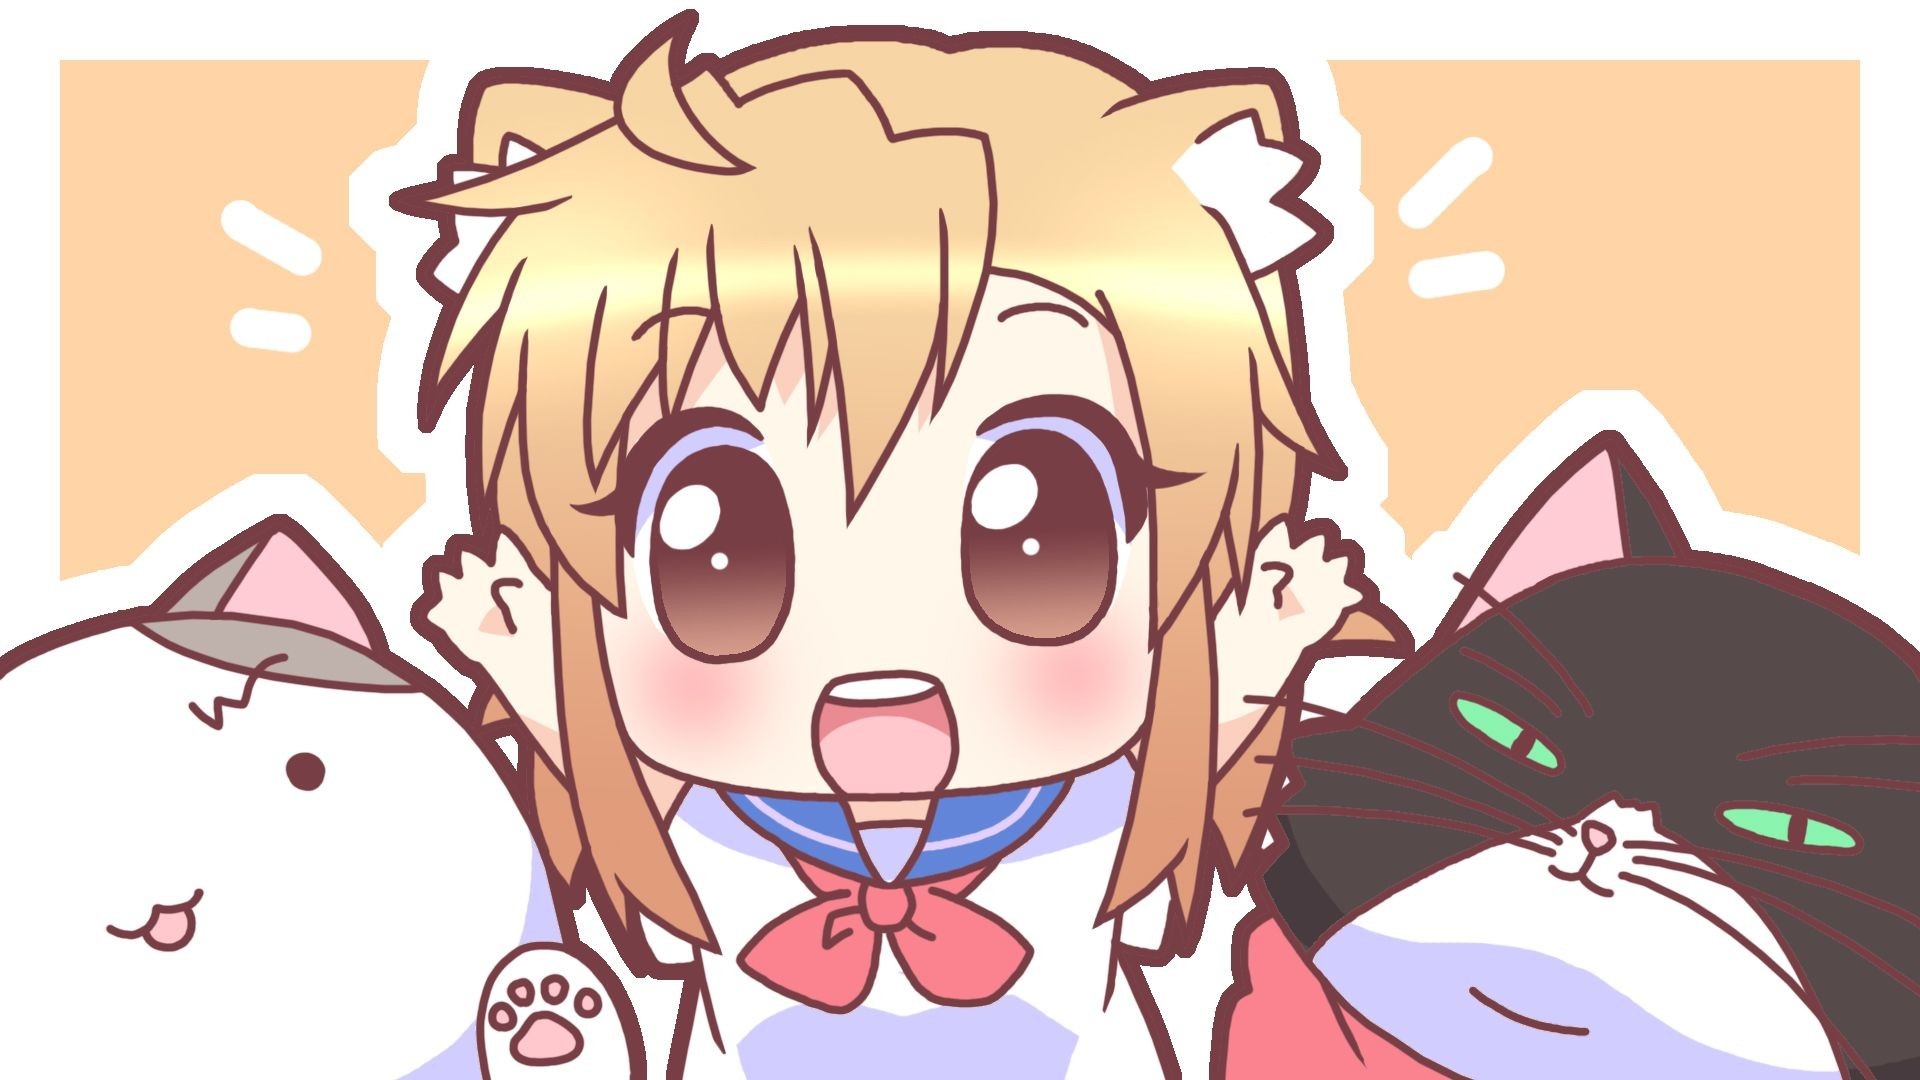 Anime Chibi Wallpapers Group   Data Src Kawaii Girl - Cute Anime Wallpaper Chibi - HD Wallpaper